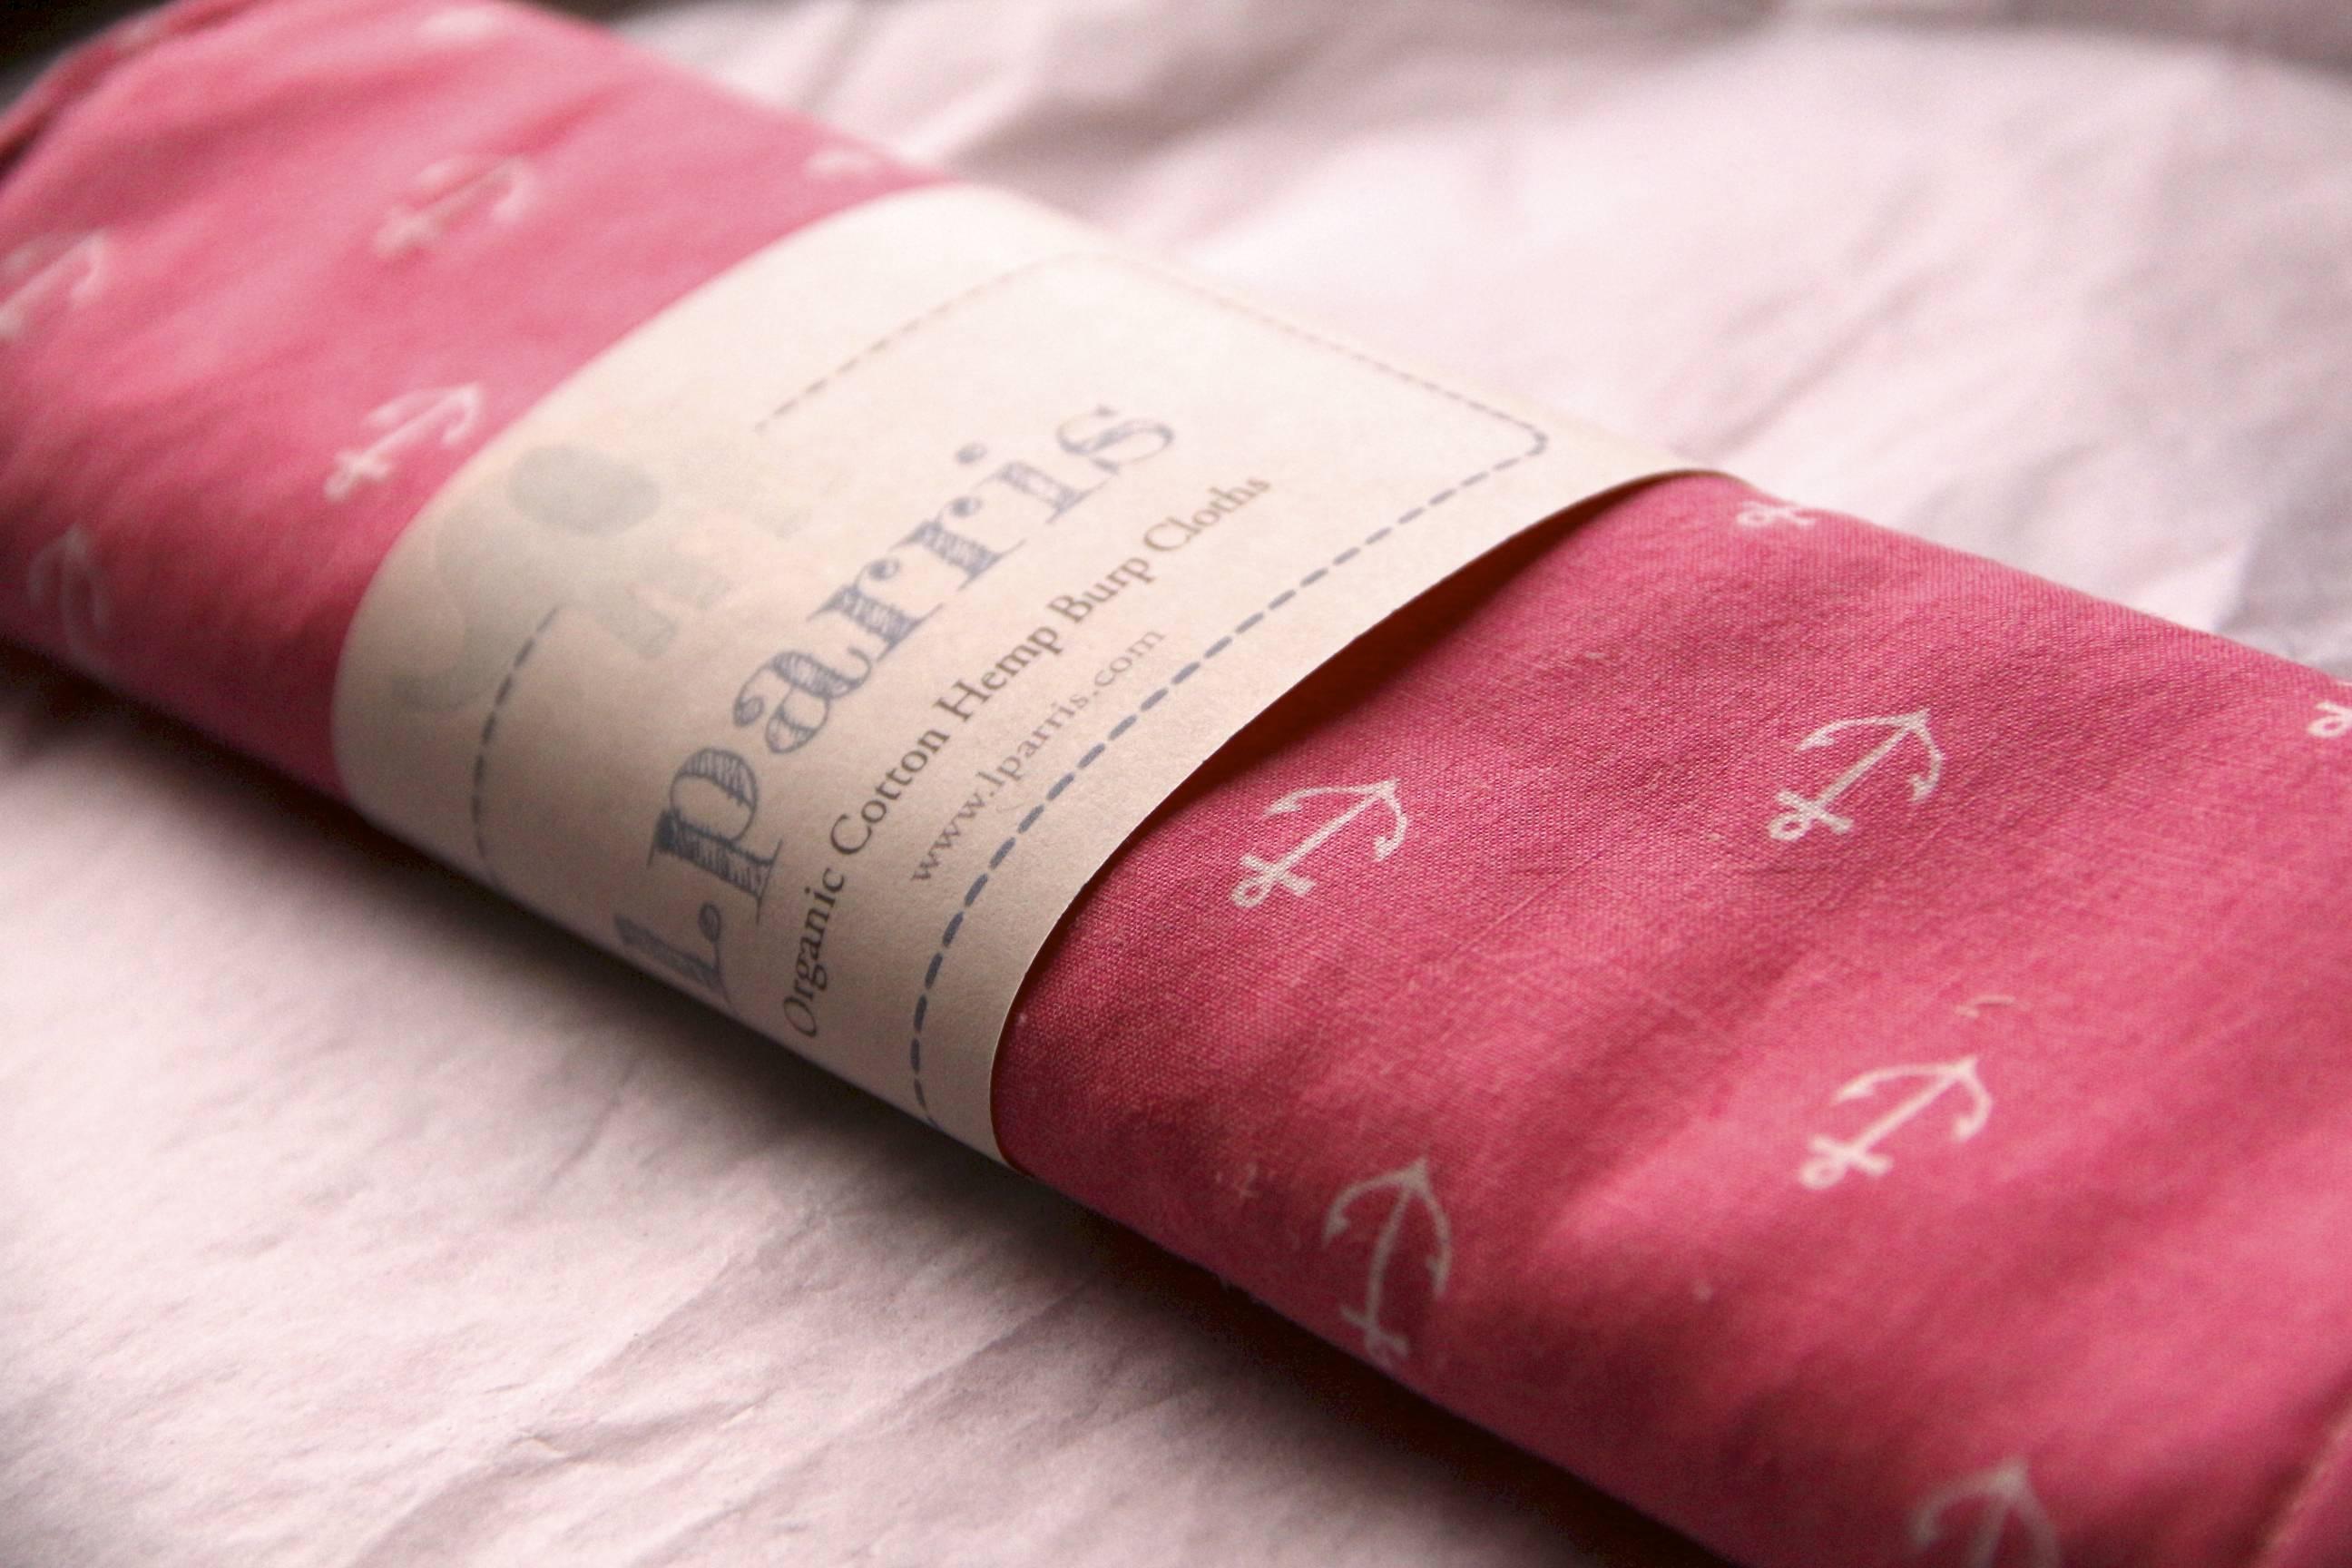 Organic Burp Cloths from L. Parris